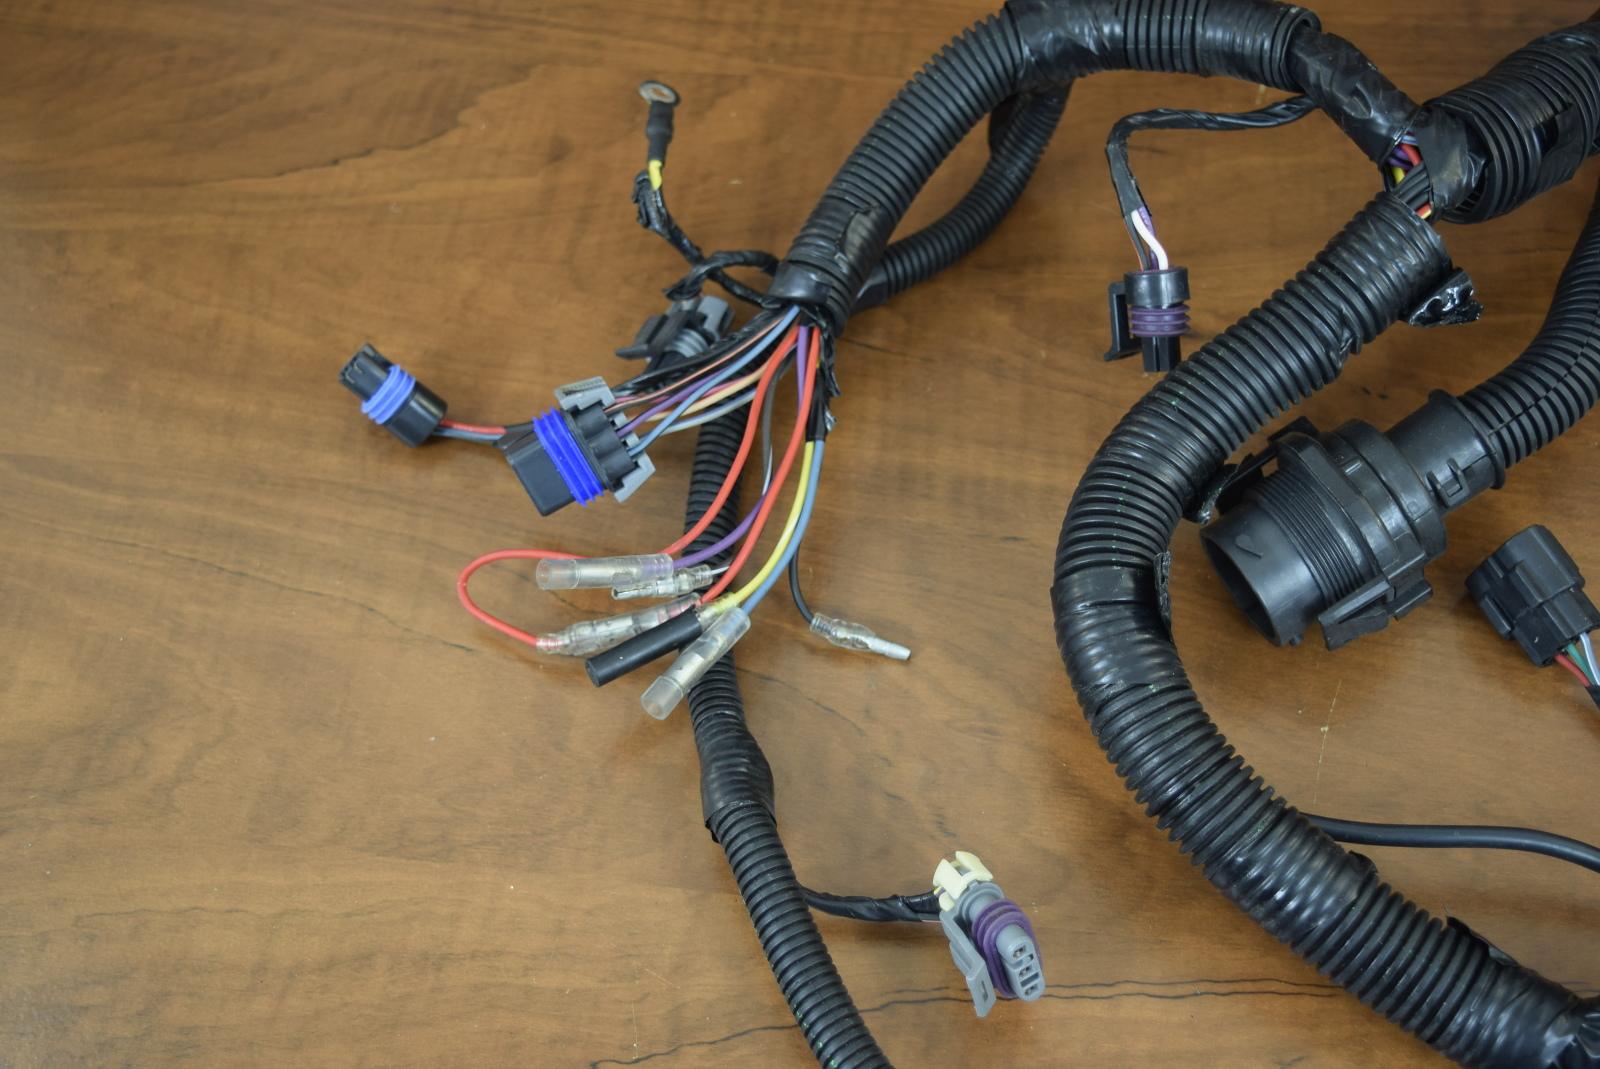 new mercury quicksilver engine wiring harness 892971t05 2006 2009 200 225 250 hp ebay